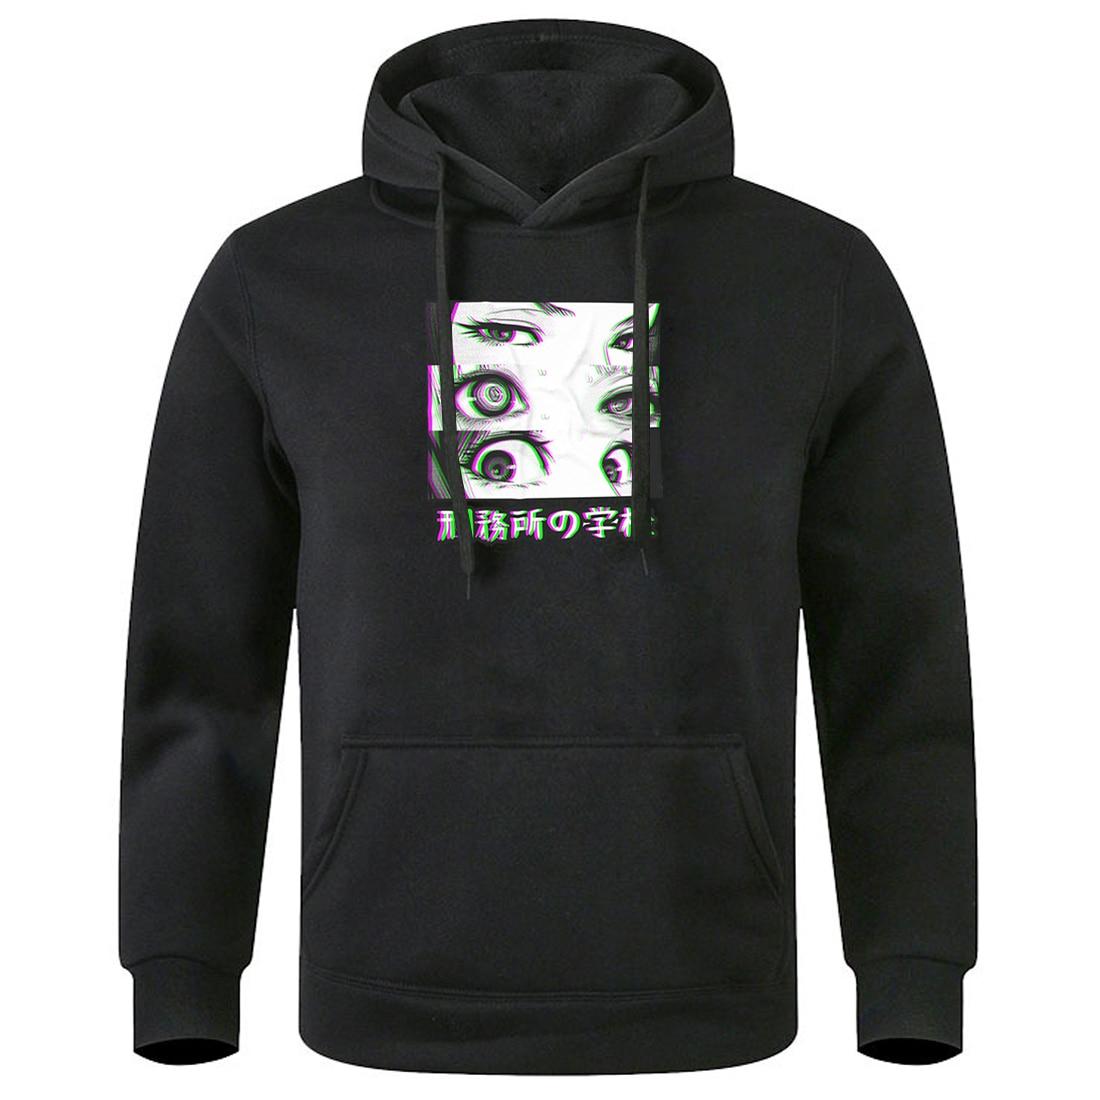 Homme Hooded Clothes Prison School Eyes Sad Hoody 2020 Keep Warm Fall Winter Sweatshirts Fashion Hipster Harajuku Hoodies Mans